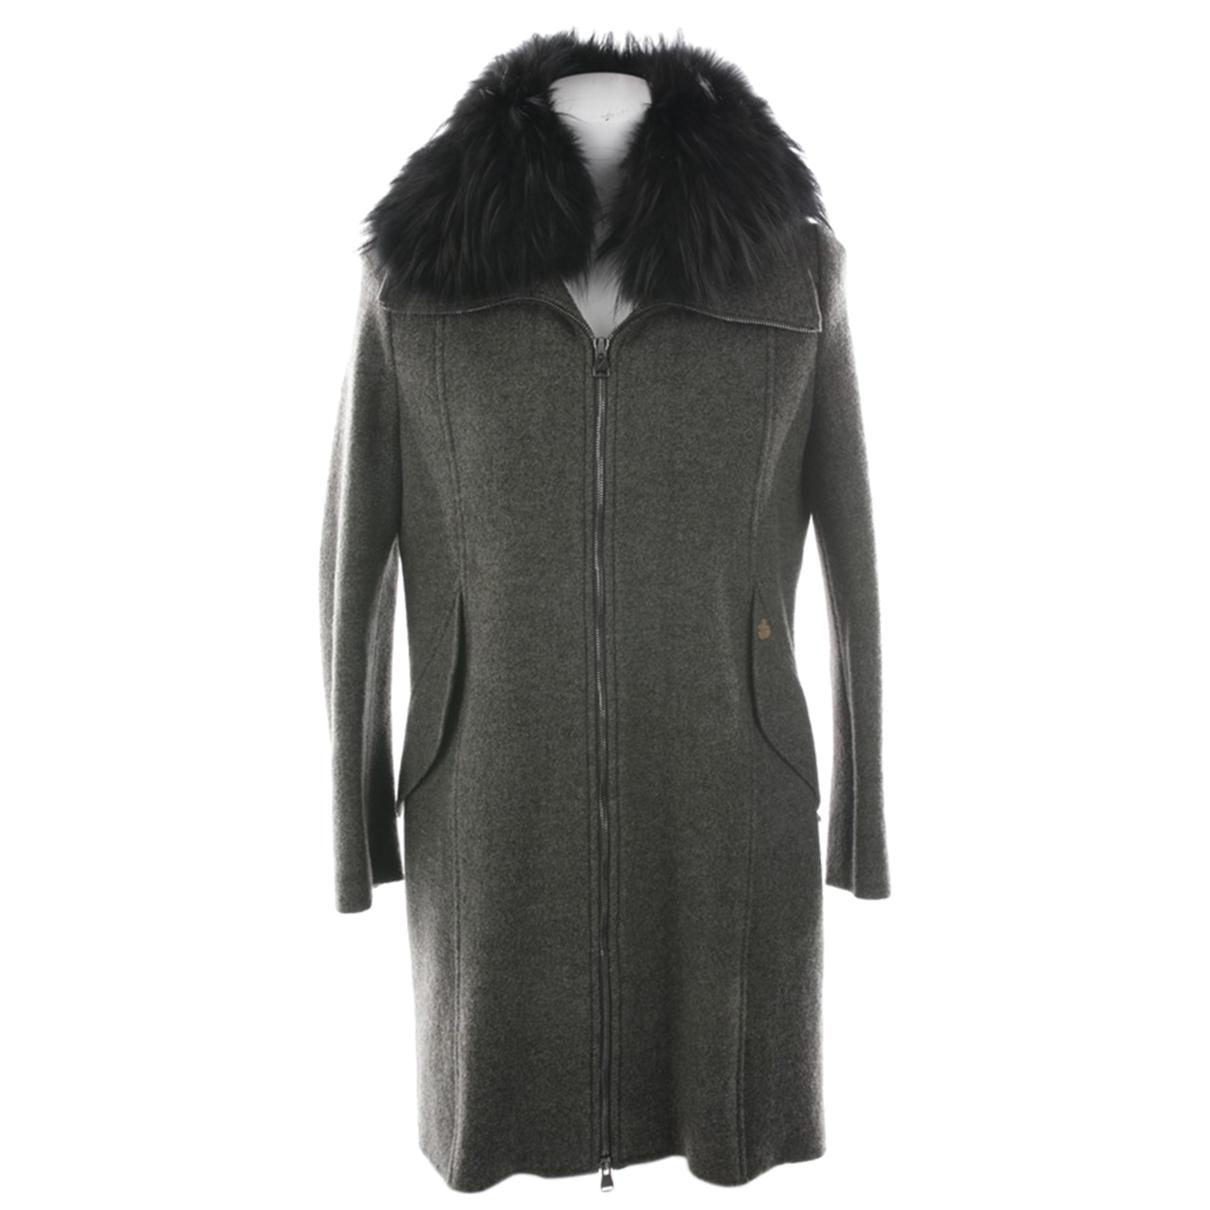 Falconeri \N Jacke in  Grau Wolle